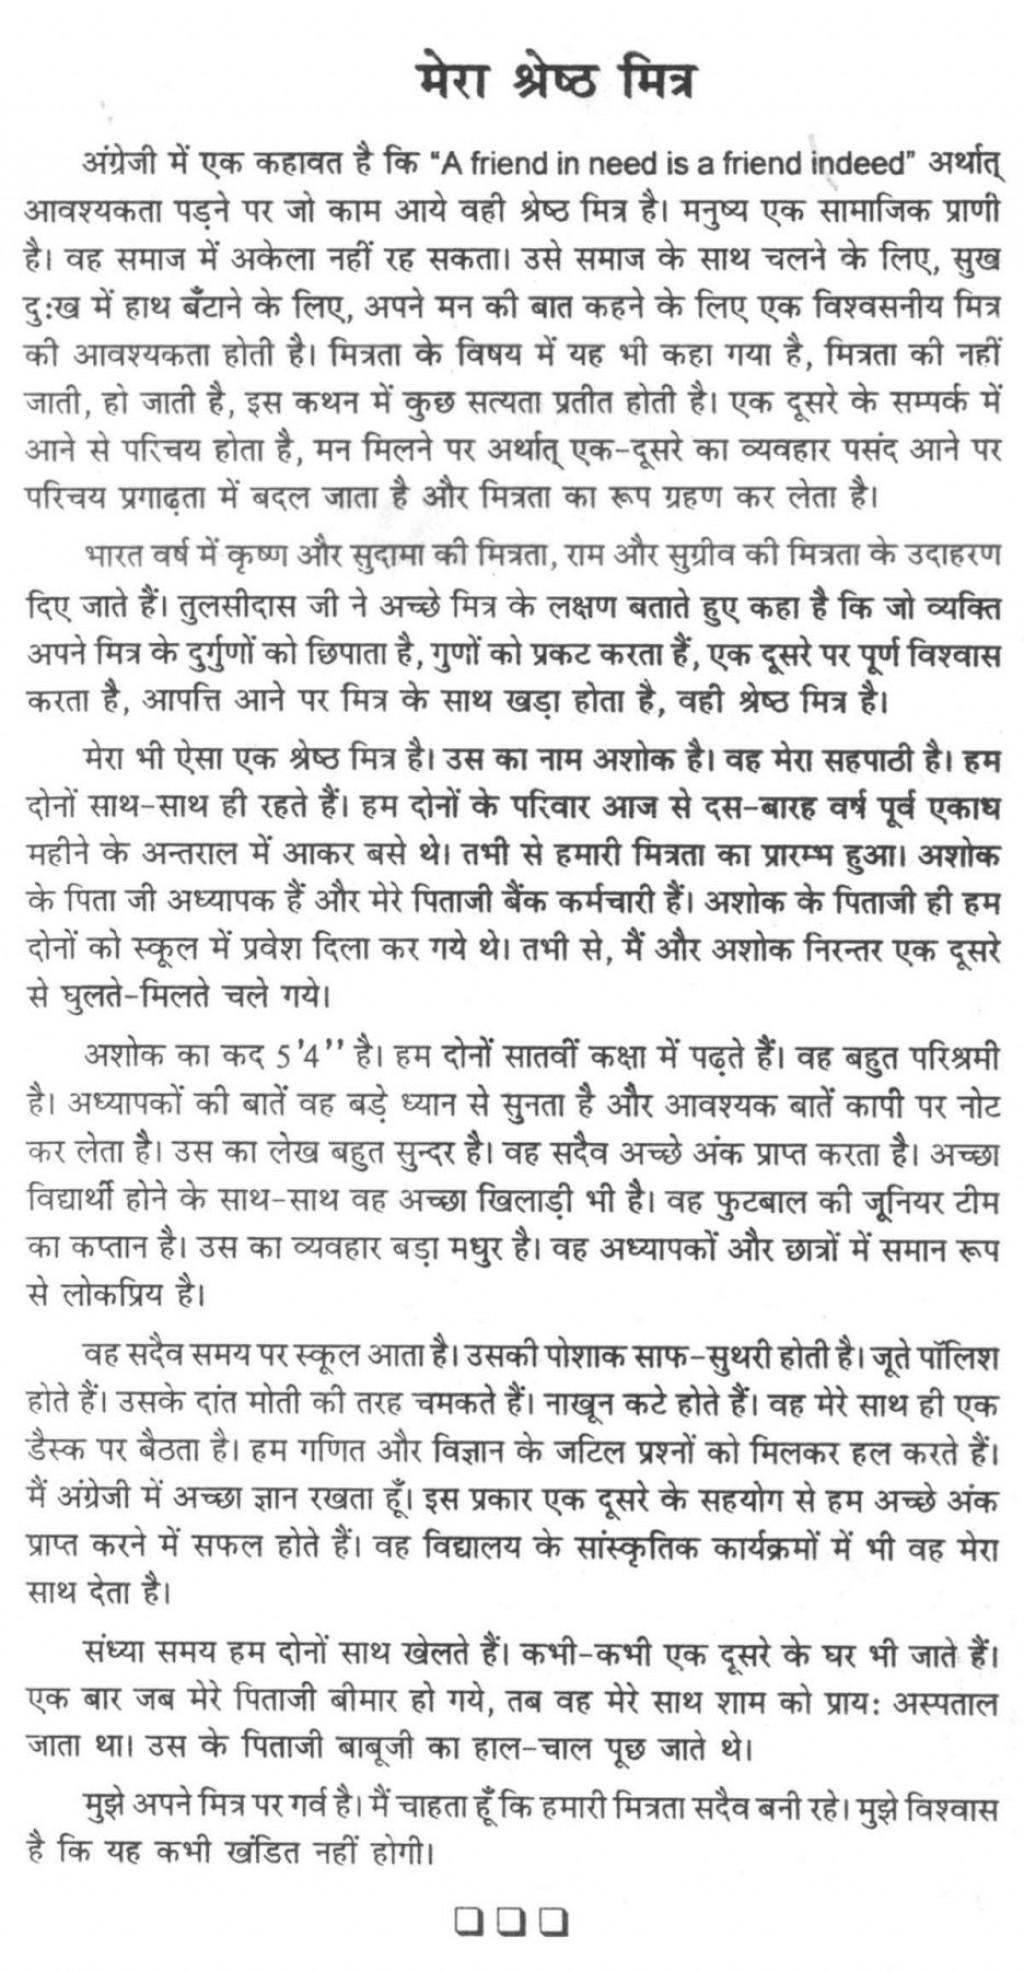 001 Essay Example Qualities Of Good Friend Thumb Teacher Great Characteristics Pdf In Hindi Three Free Language Urdu Exceptional A Short Large